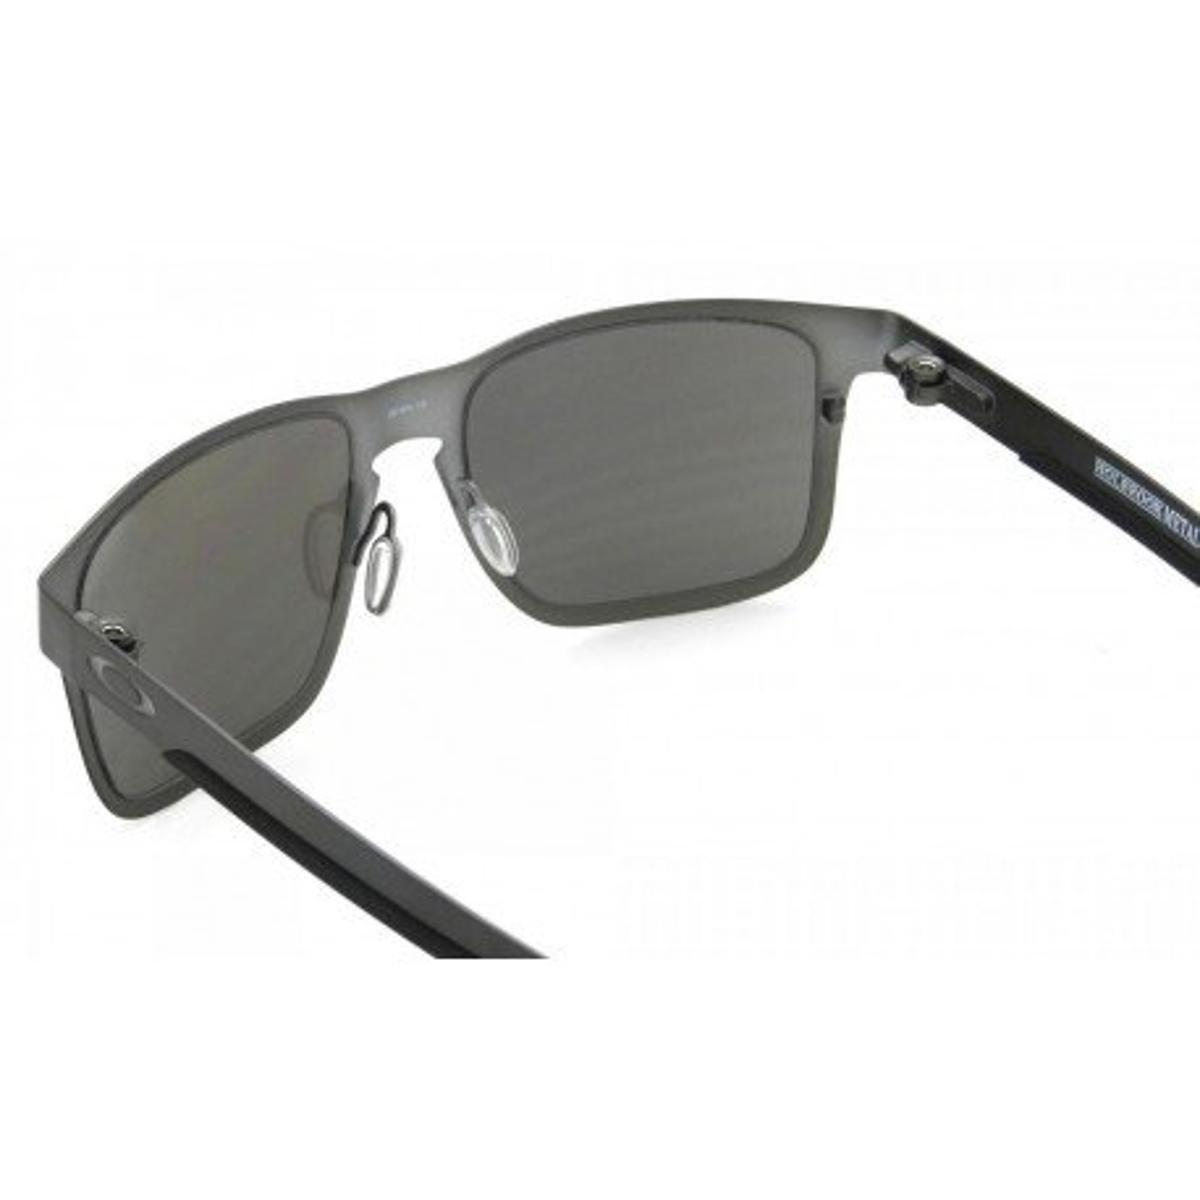 ede430c6f2f4f Óculos Oakley Holbrook Metal Polarizado OO4123-06 - Compre Agora ...